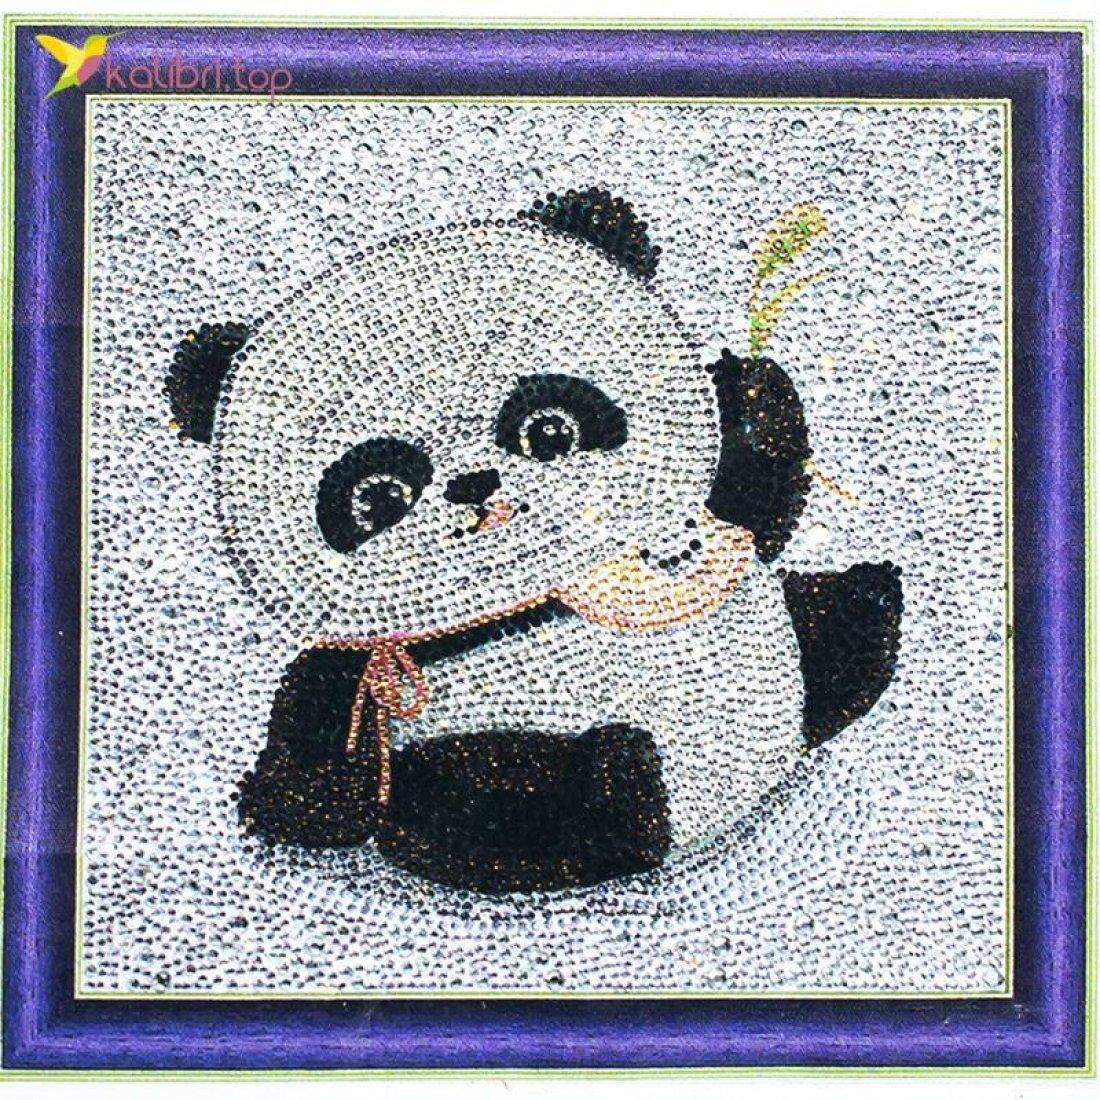 Алмазная мозаика по номерам Панда 30*30 см оптом фото 01